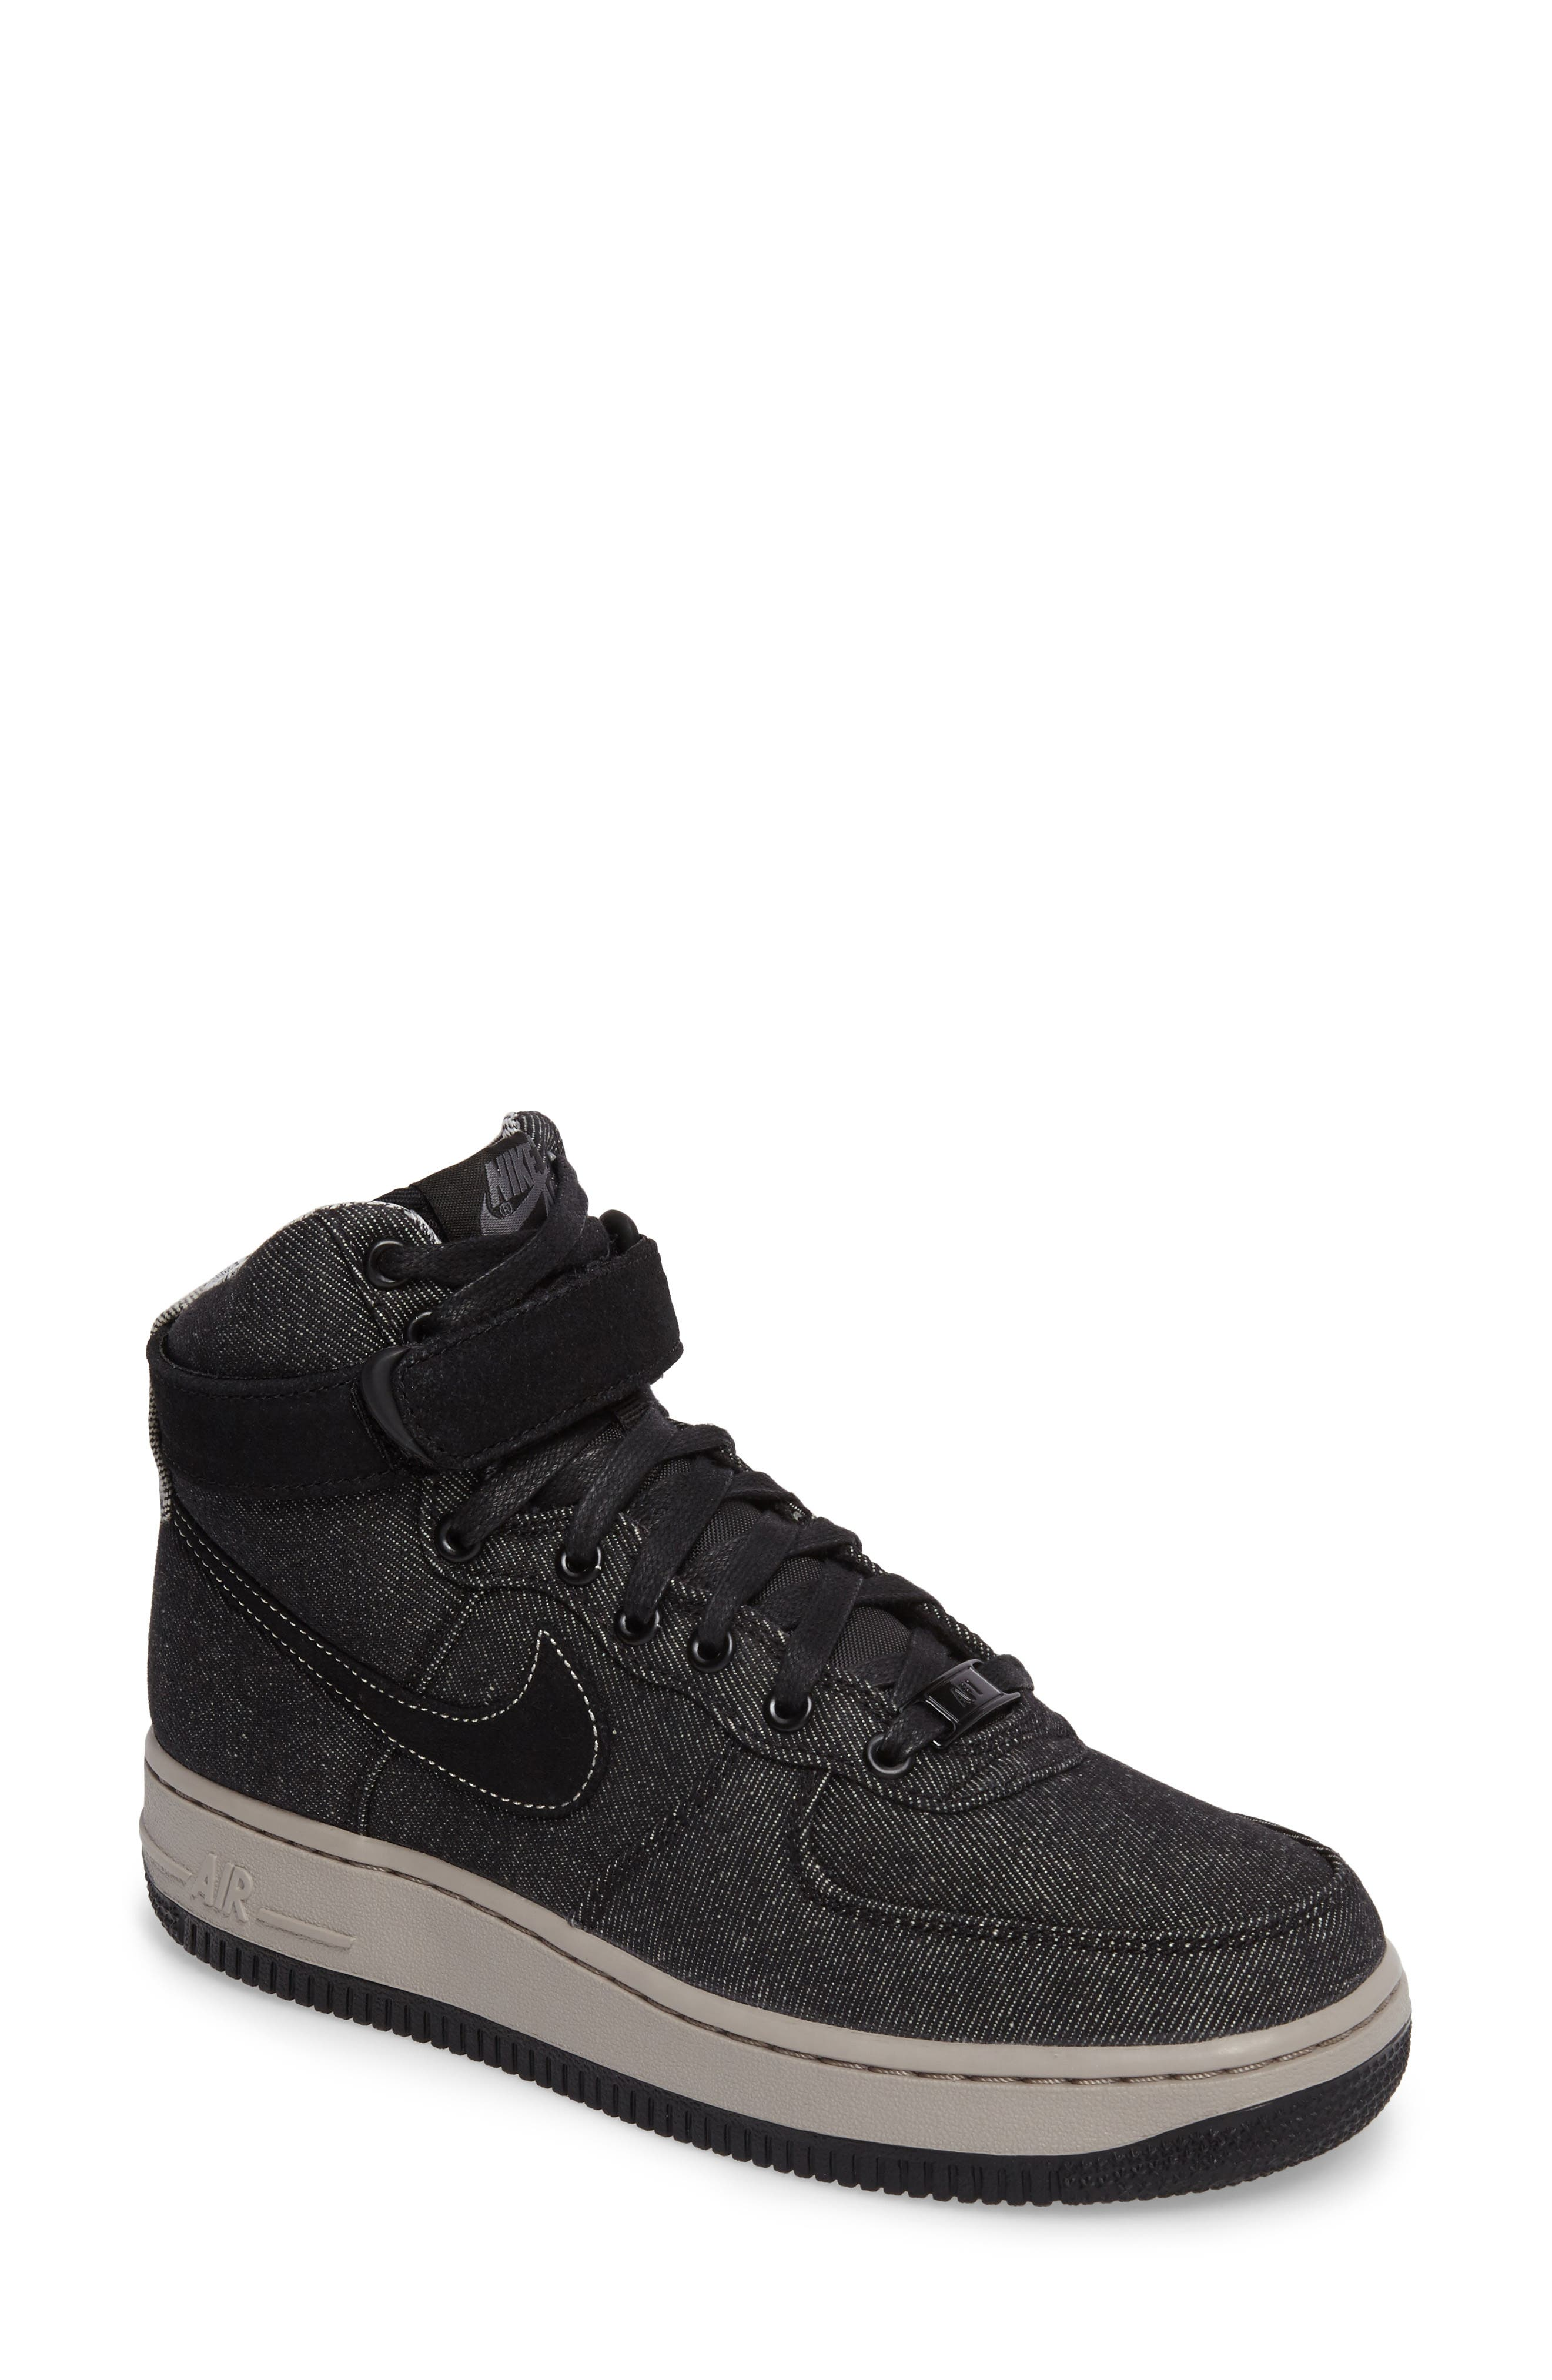 Nike Air Force 1 High Top SE Sneaker (Women)